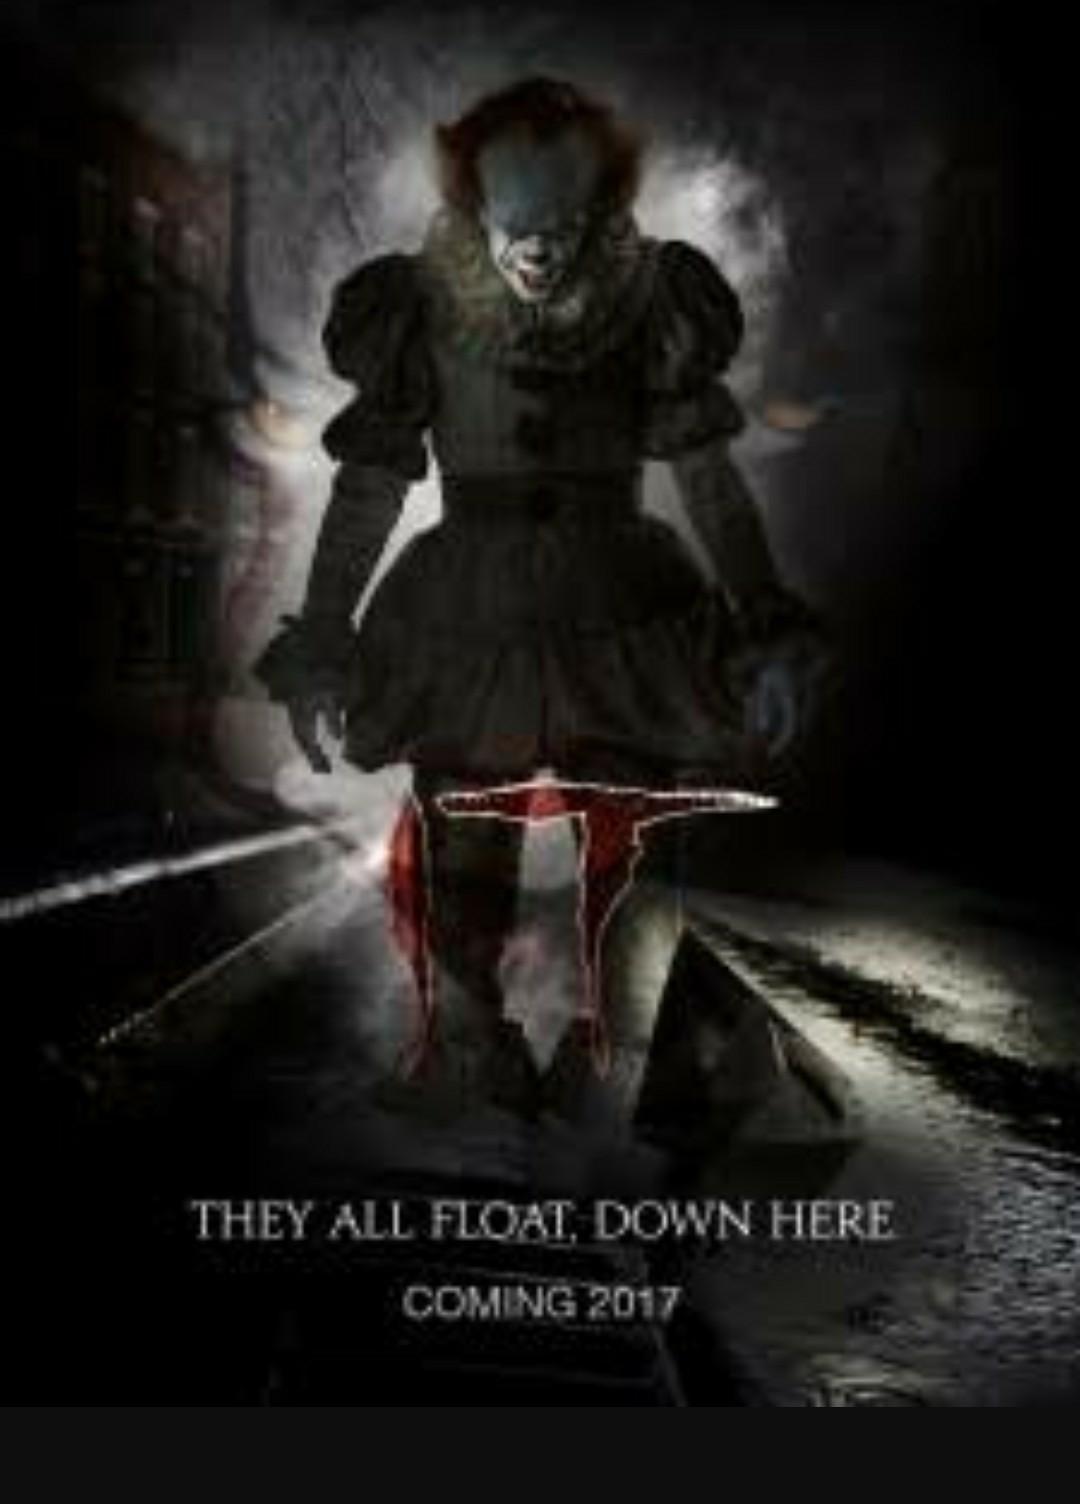 Latest movie offers